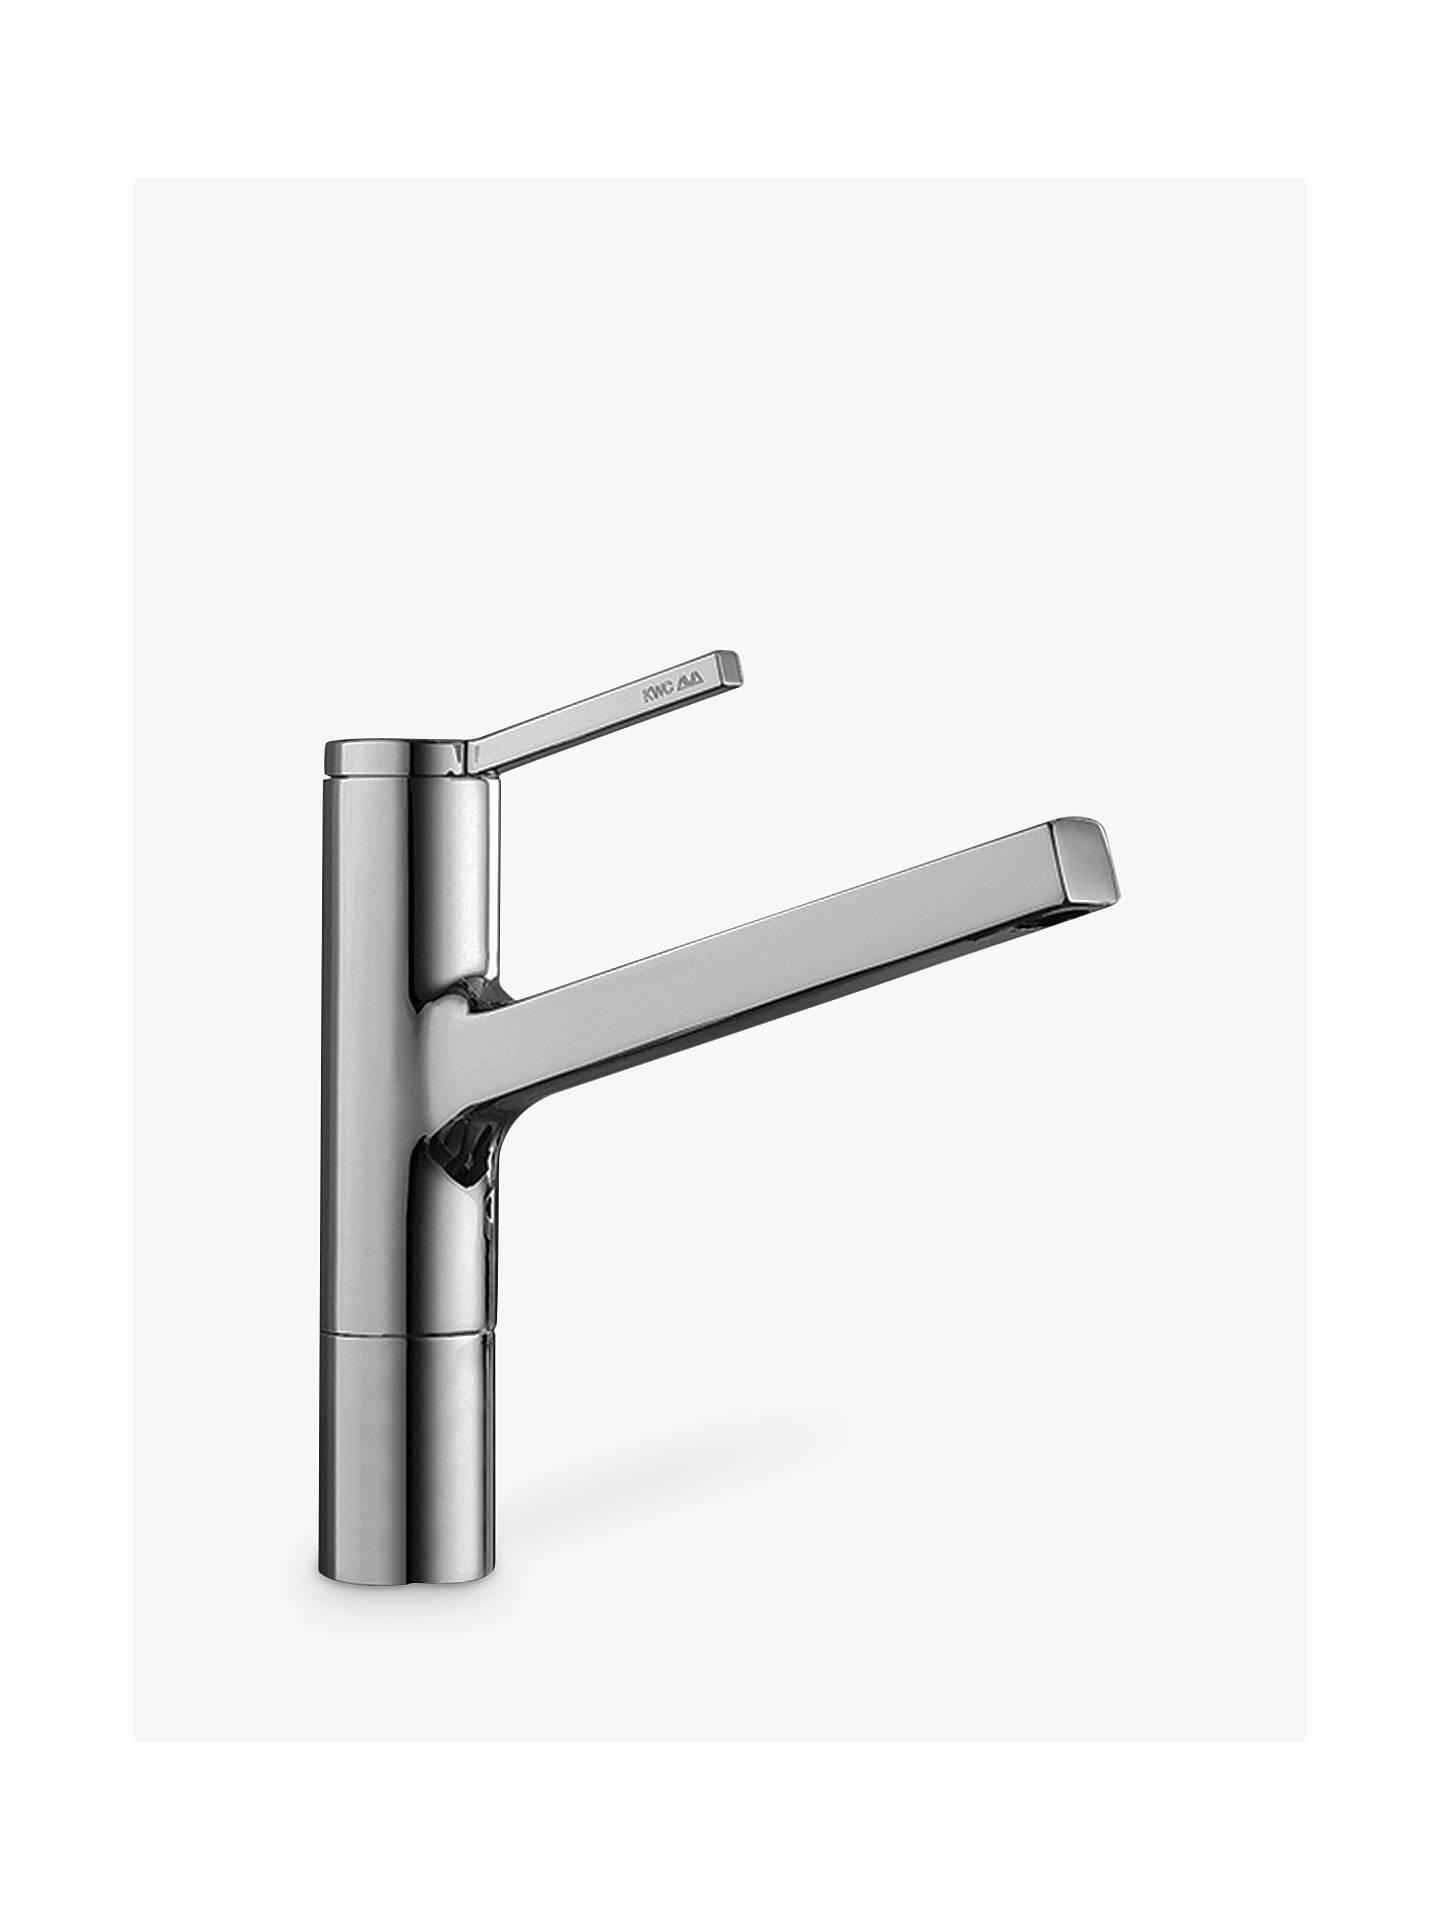 Kwc Ava Kitchen Faucet Design Inspiration Architecture Interior Rh Elizadiaries Com